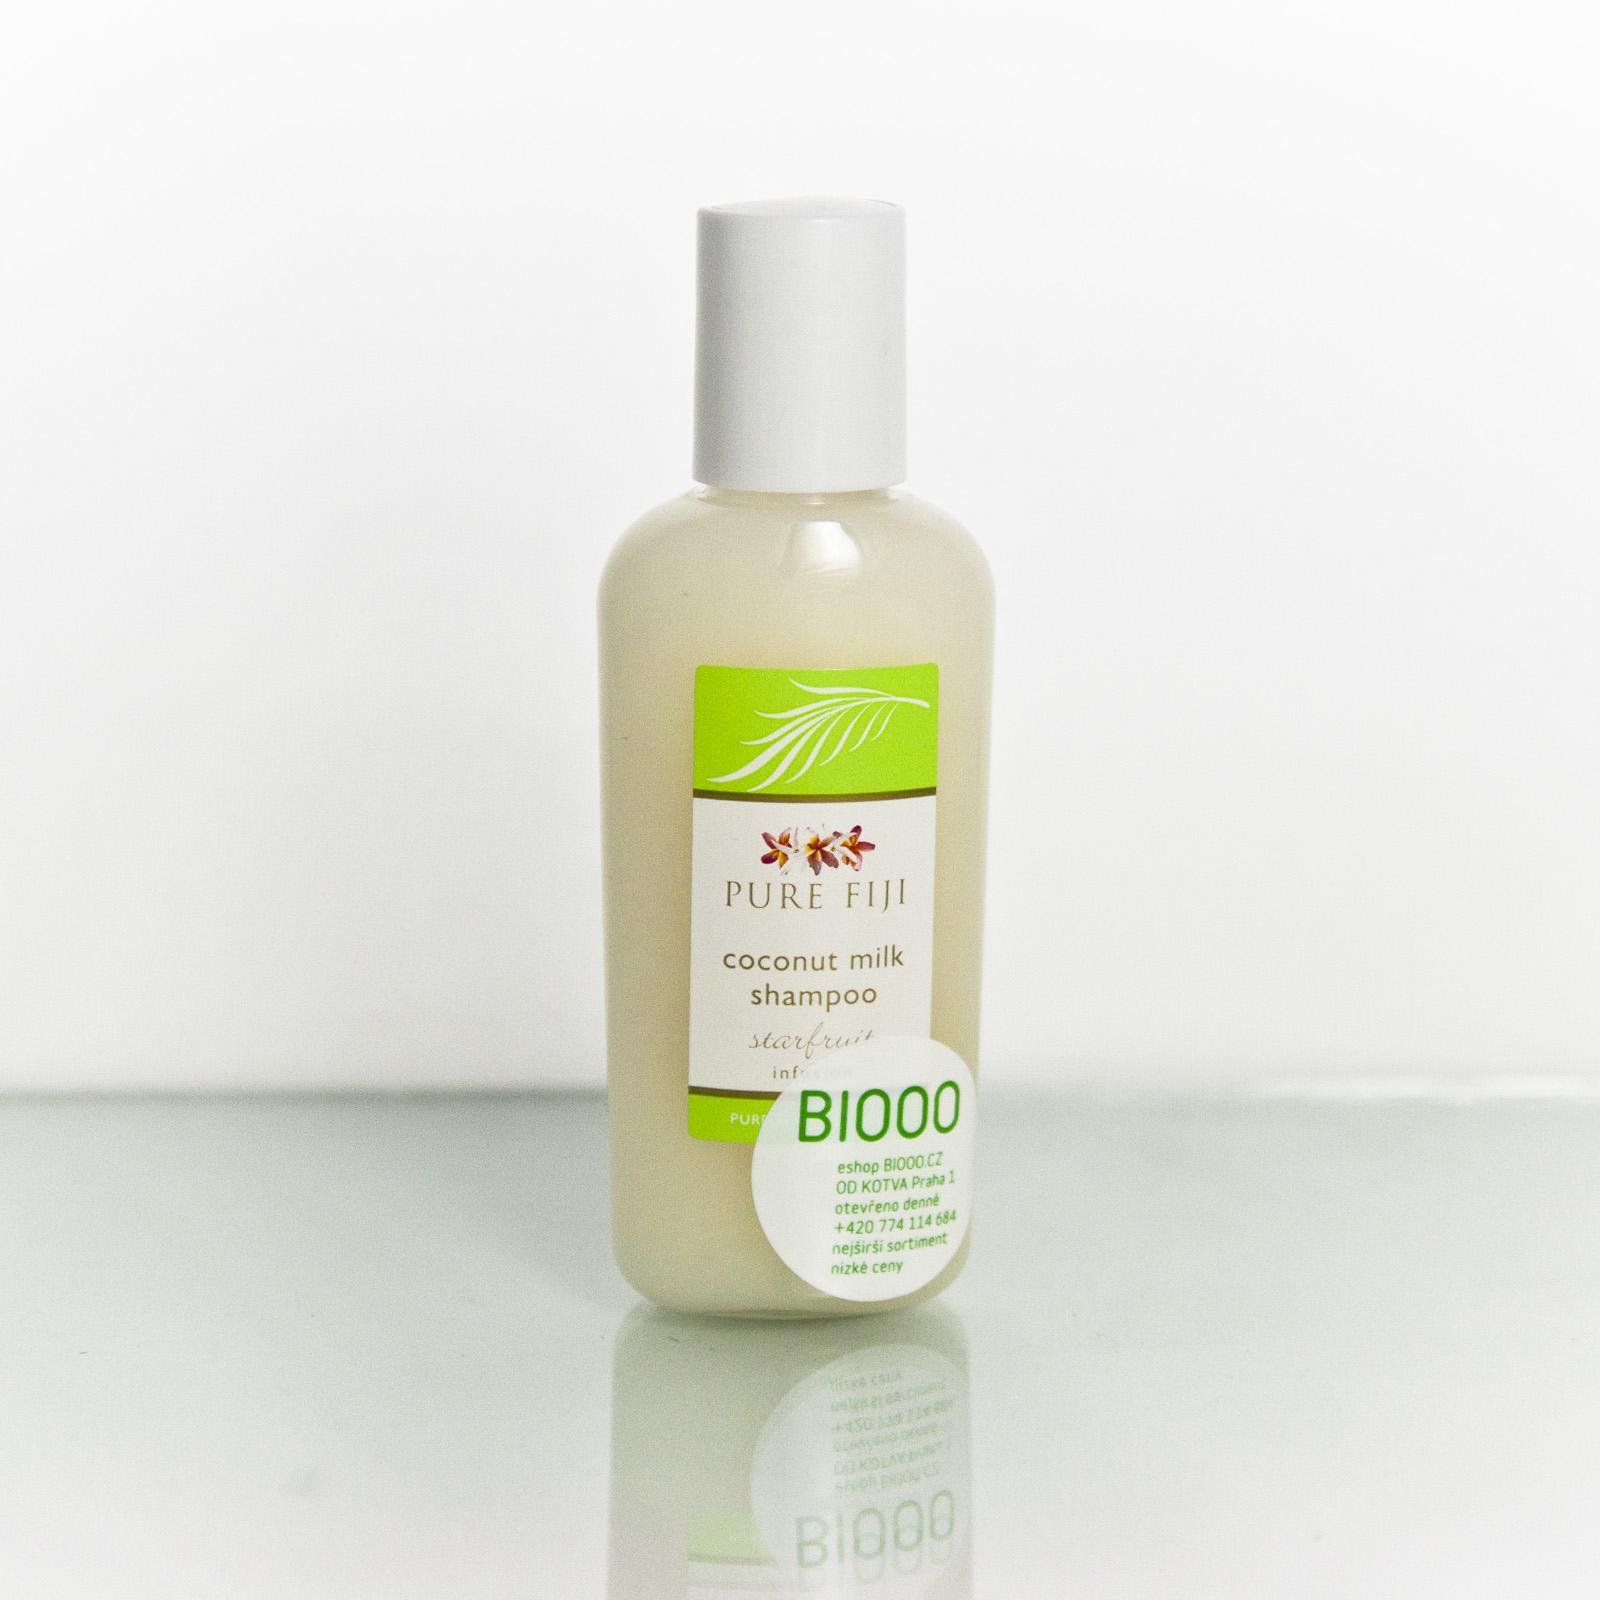 Pure Fiji Kokosový šampon, karambola 59 ml